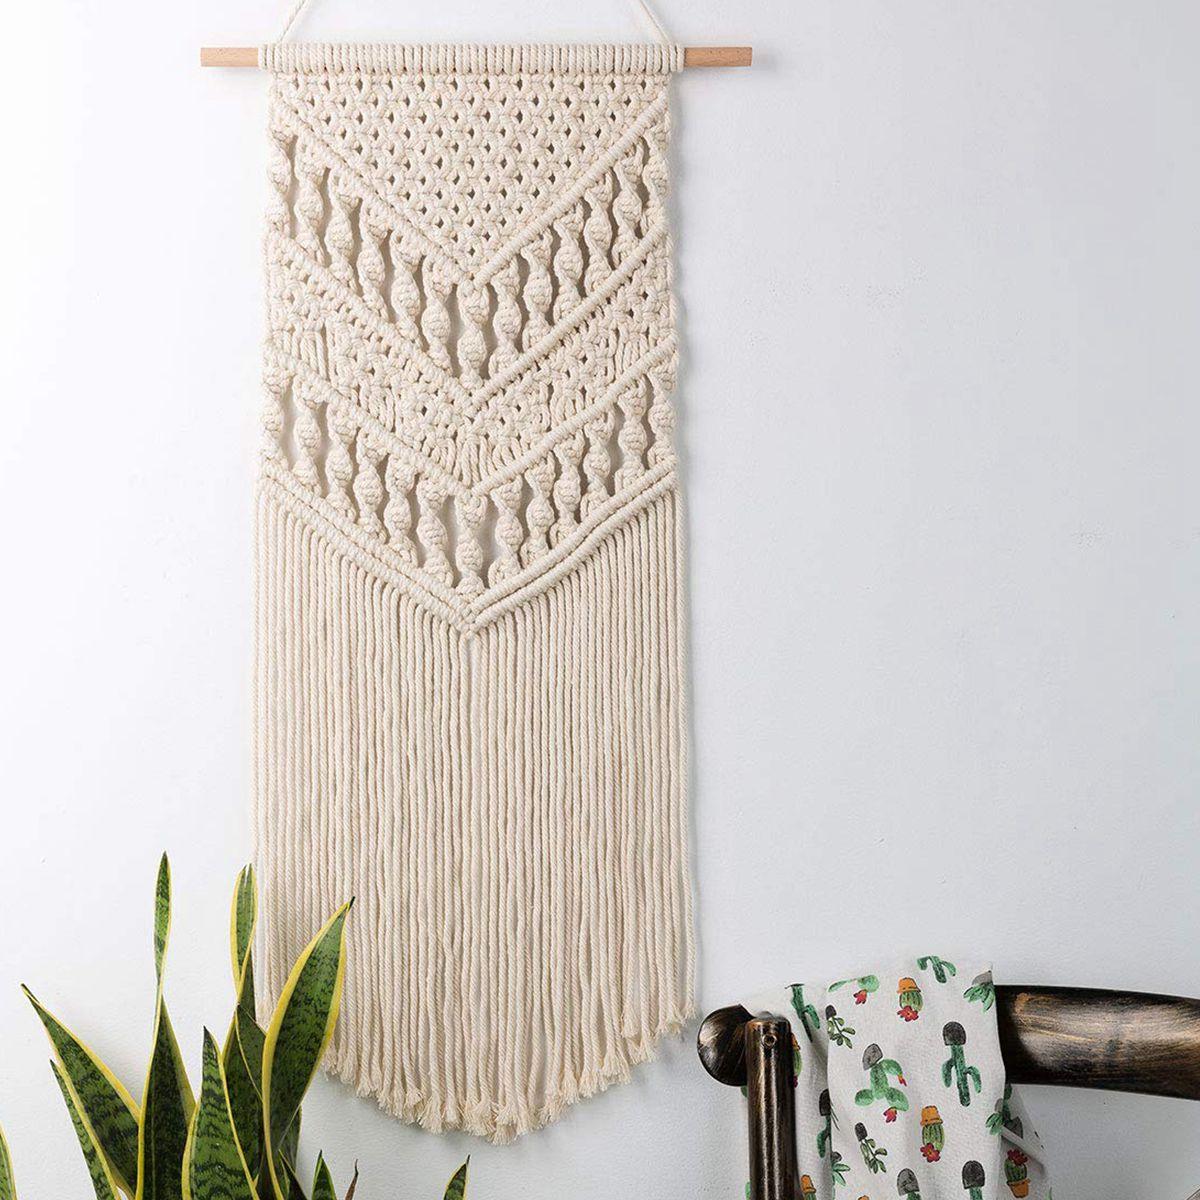 Macrame Woven Wall Hanging…